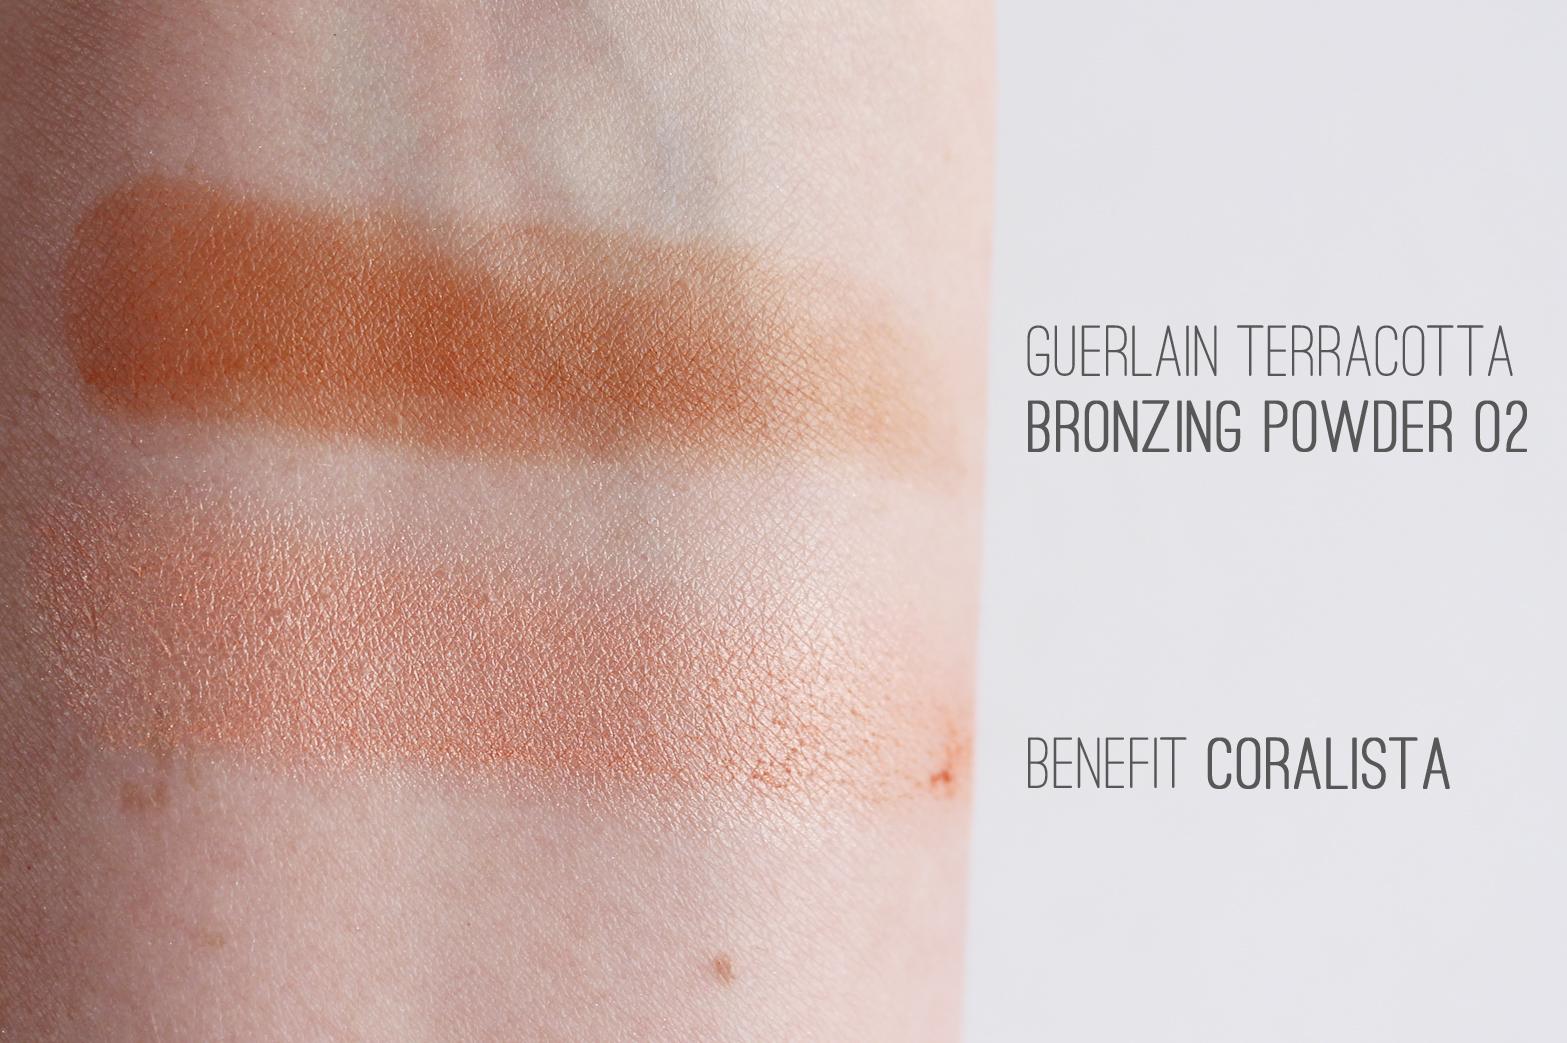 COSME-DE.COM   Haul - Guerlain Terracotta Bronzing Powder in 02 + Benefit Coralista Blush - CassandraMyee